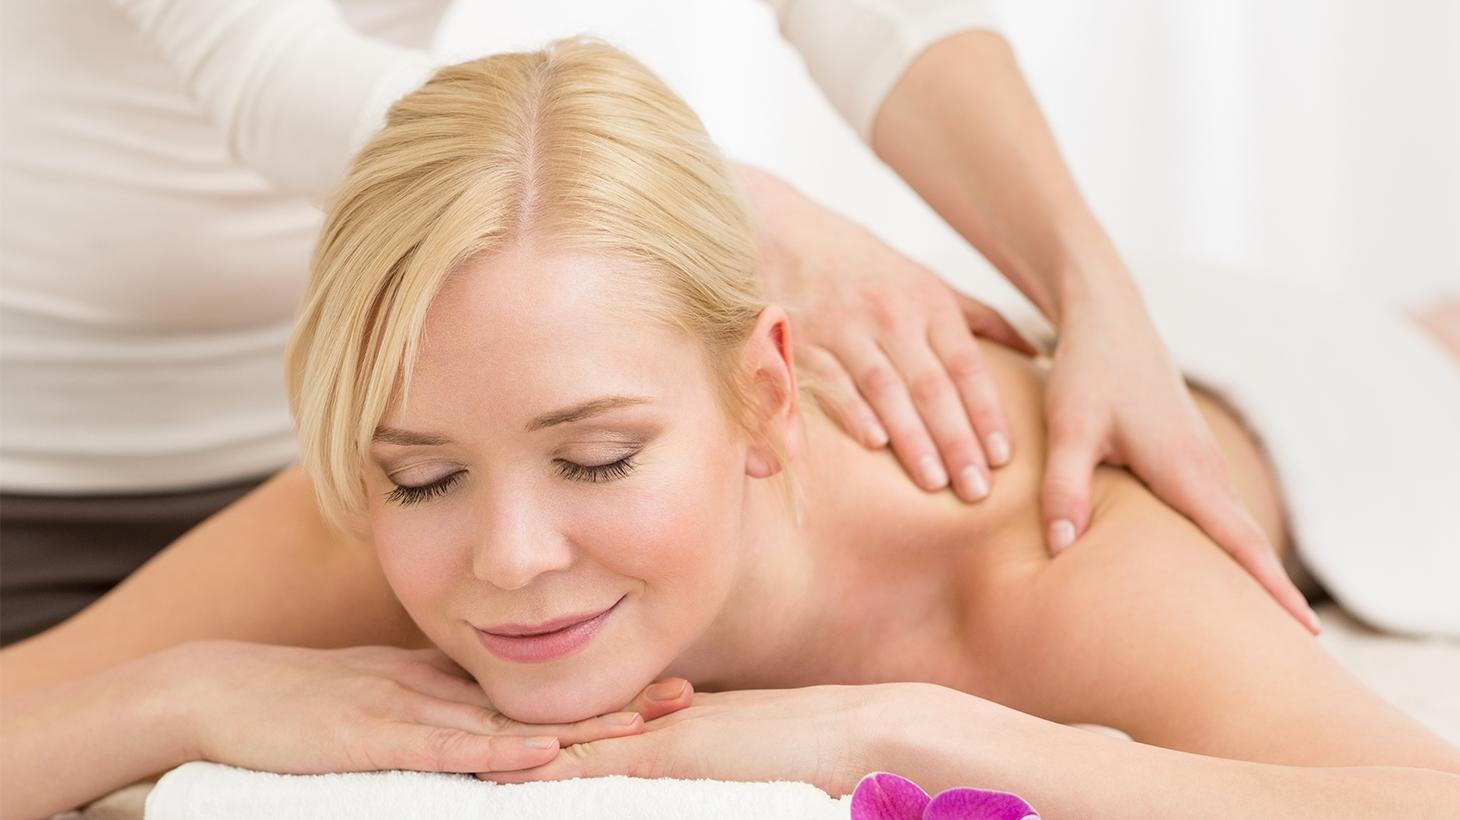 Blonde woman having a back massage